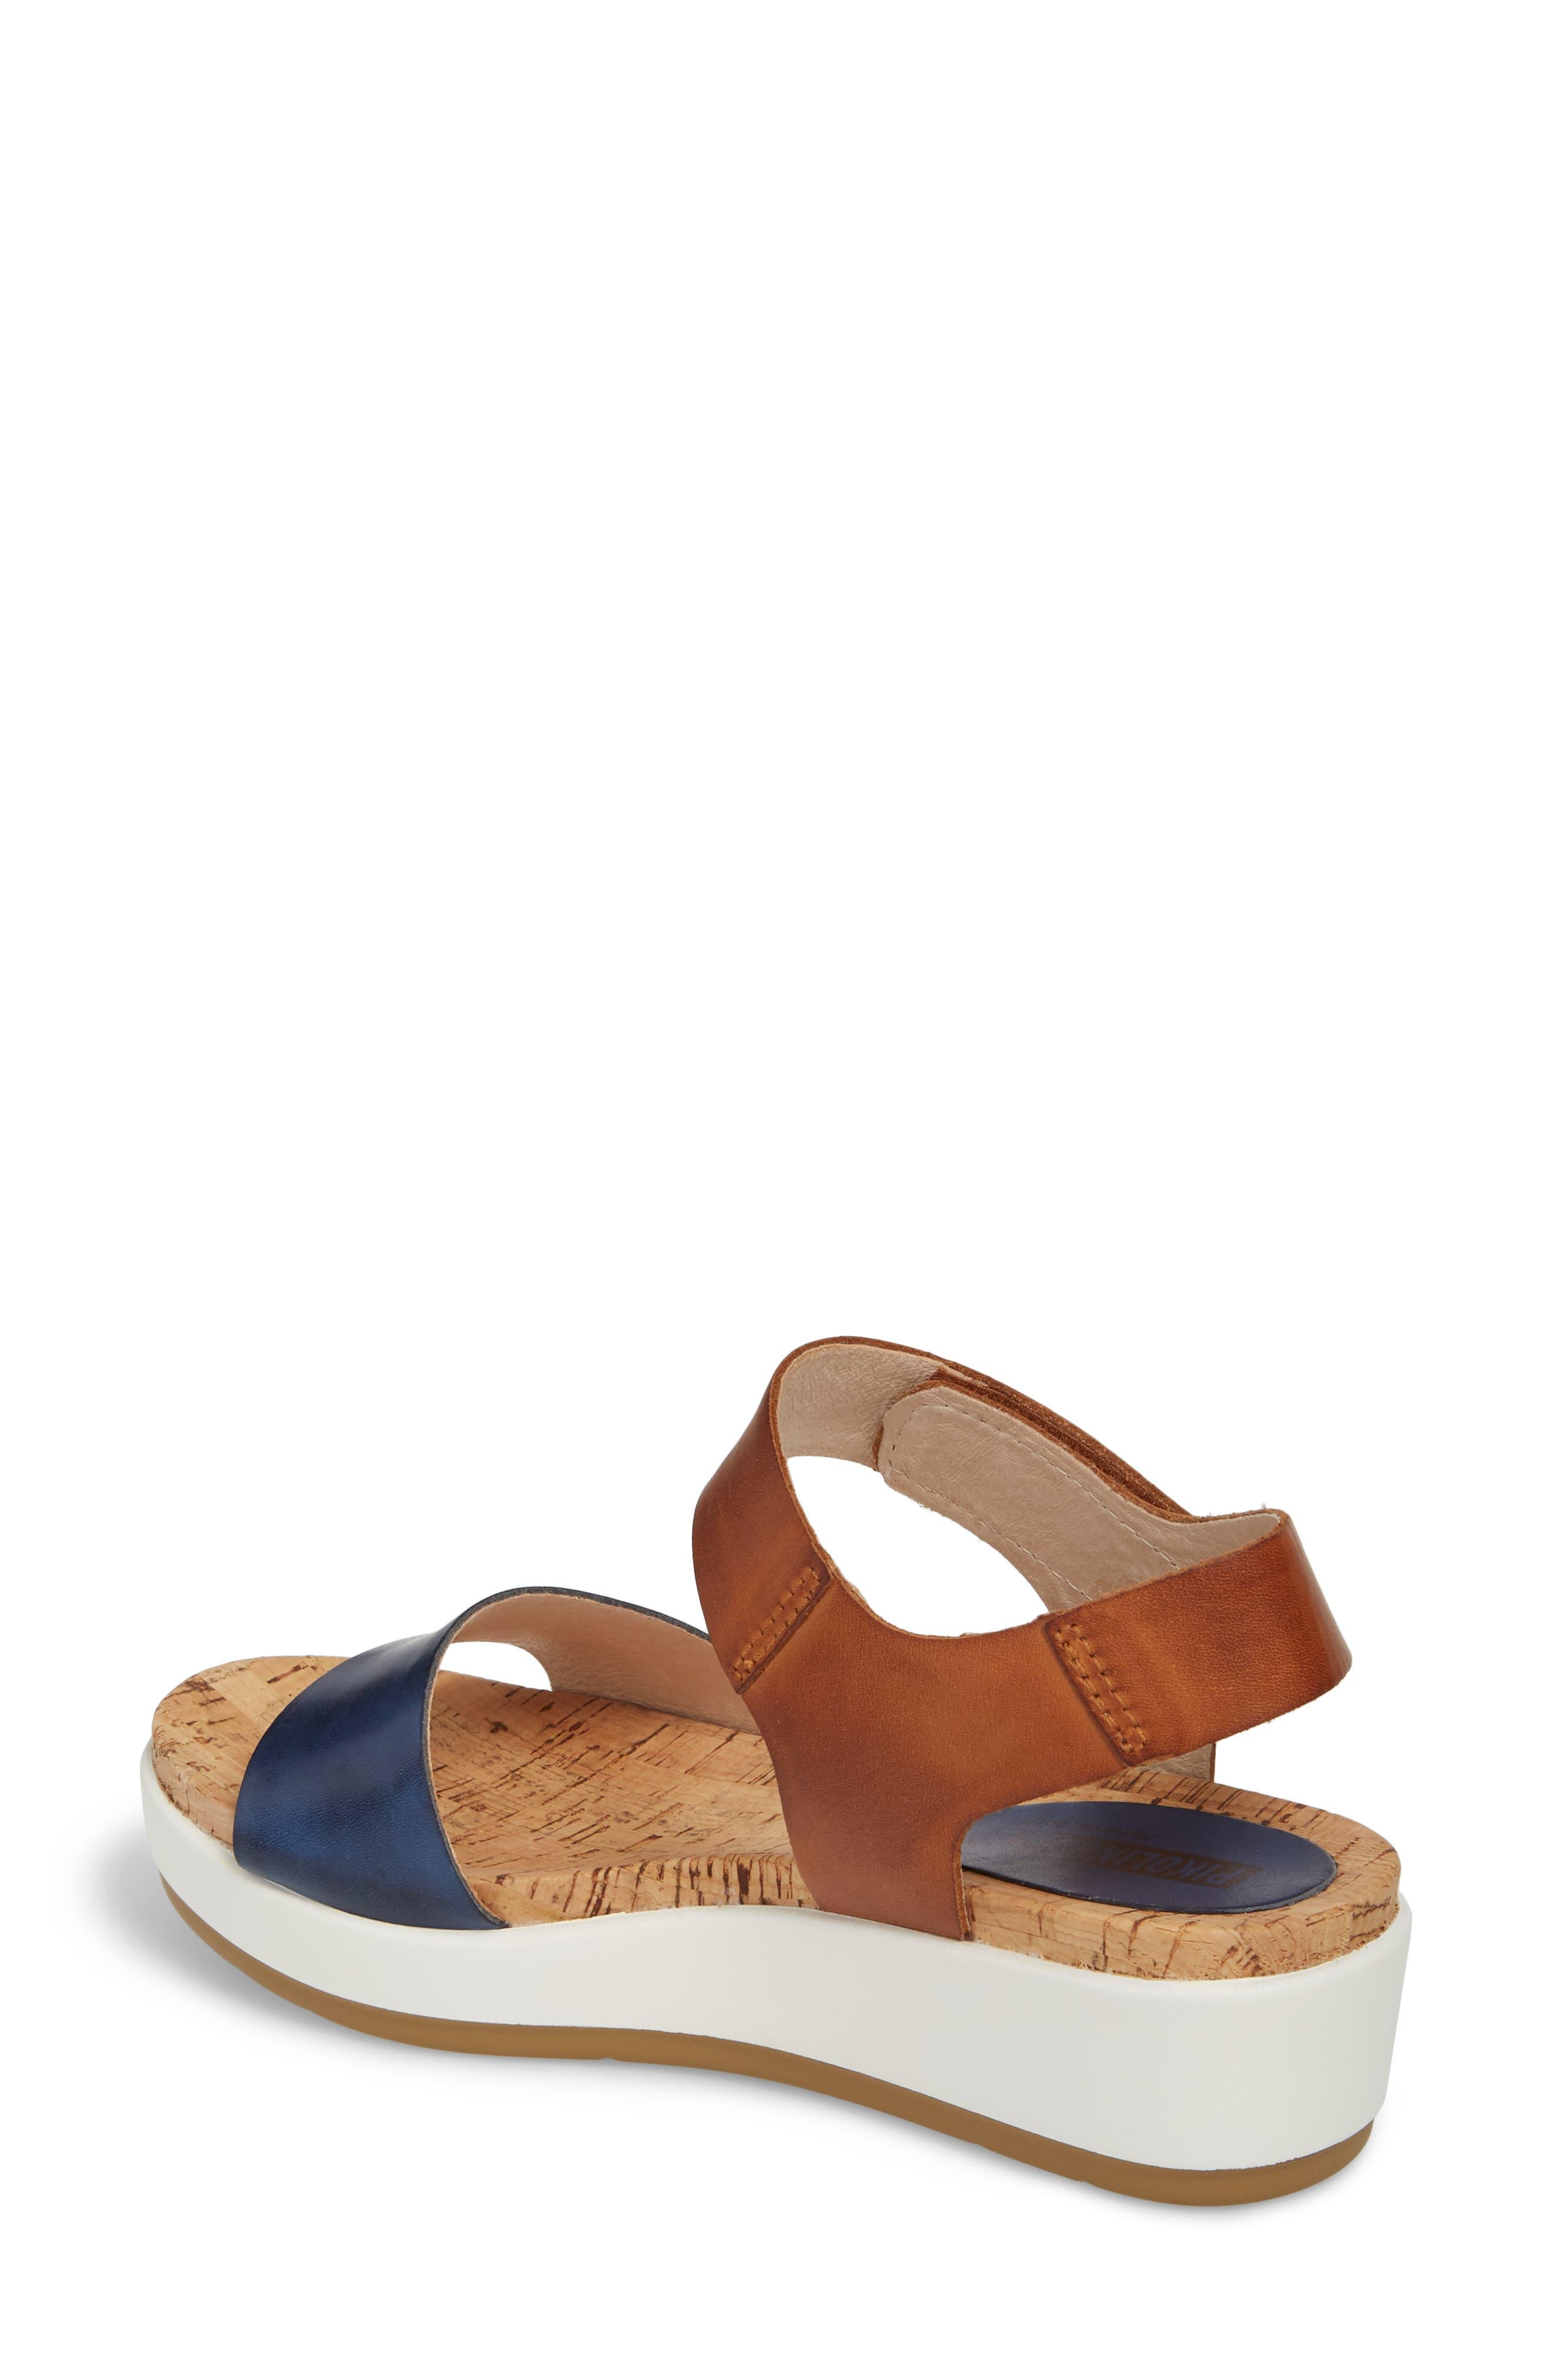 Mykonos Sport Sandal,                             Alternate thumbnail 2, color,                             Royal Blue Leather